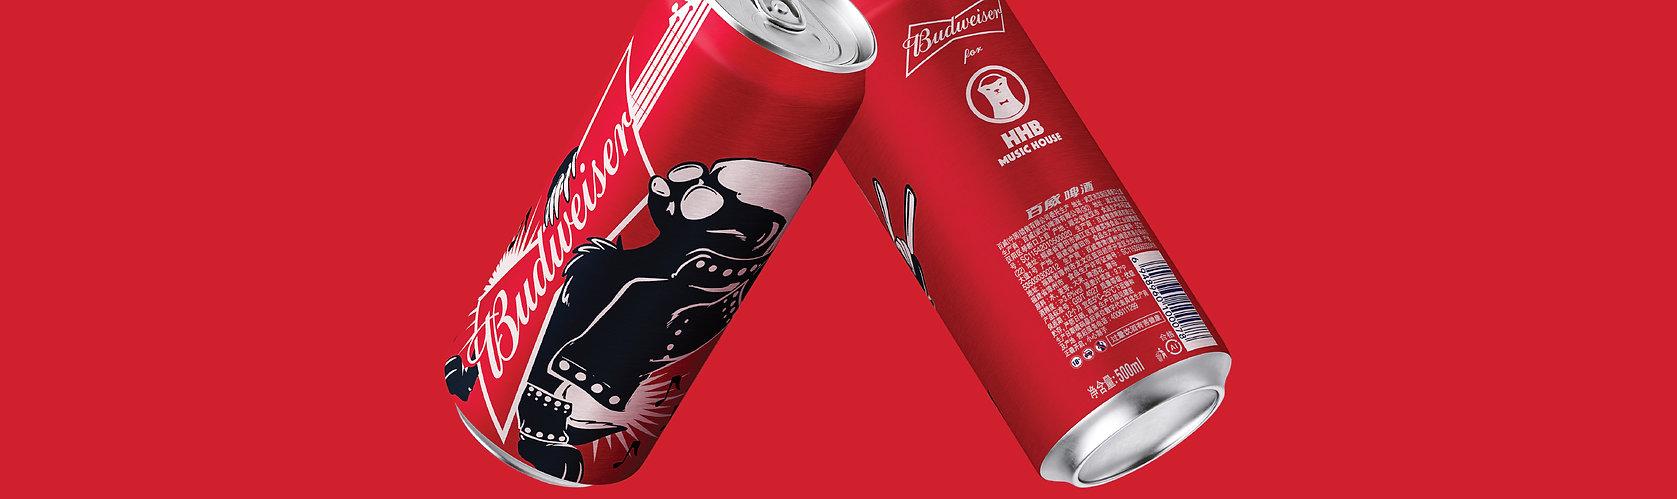 ADDLESS DESIGN STUDIO - Budweiser-HHB-pa